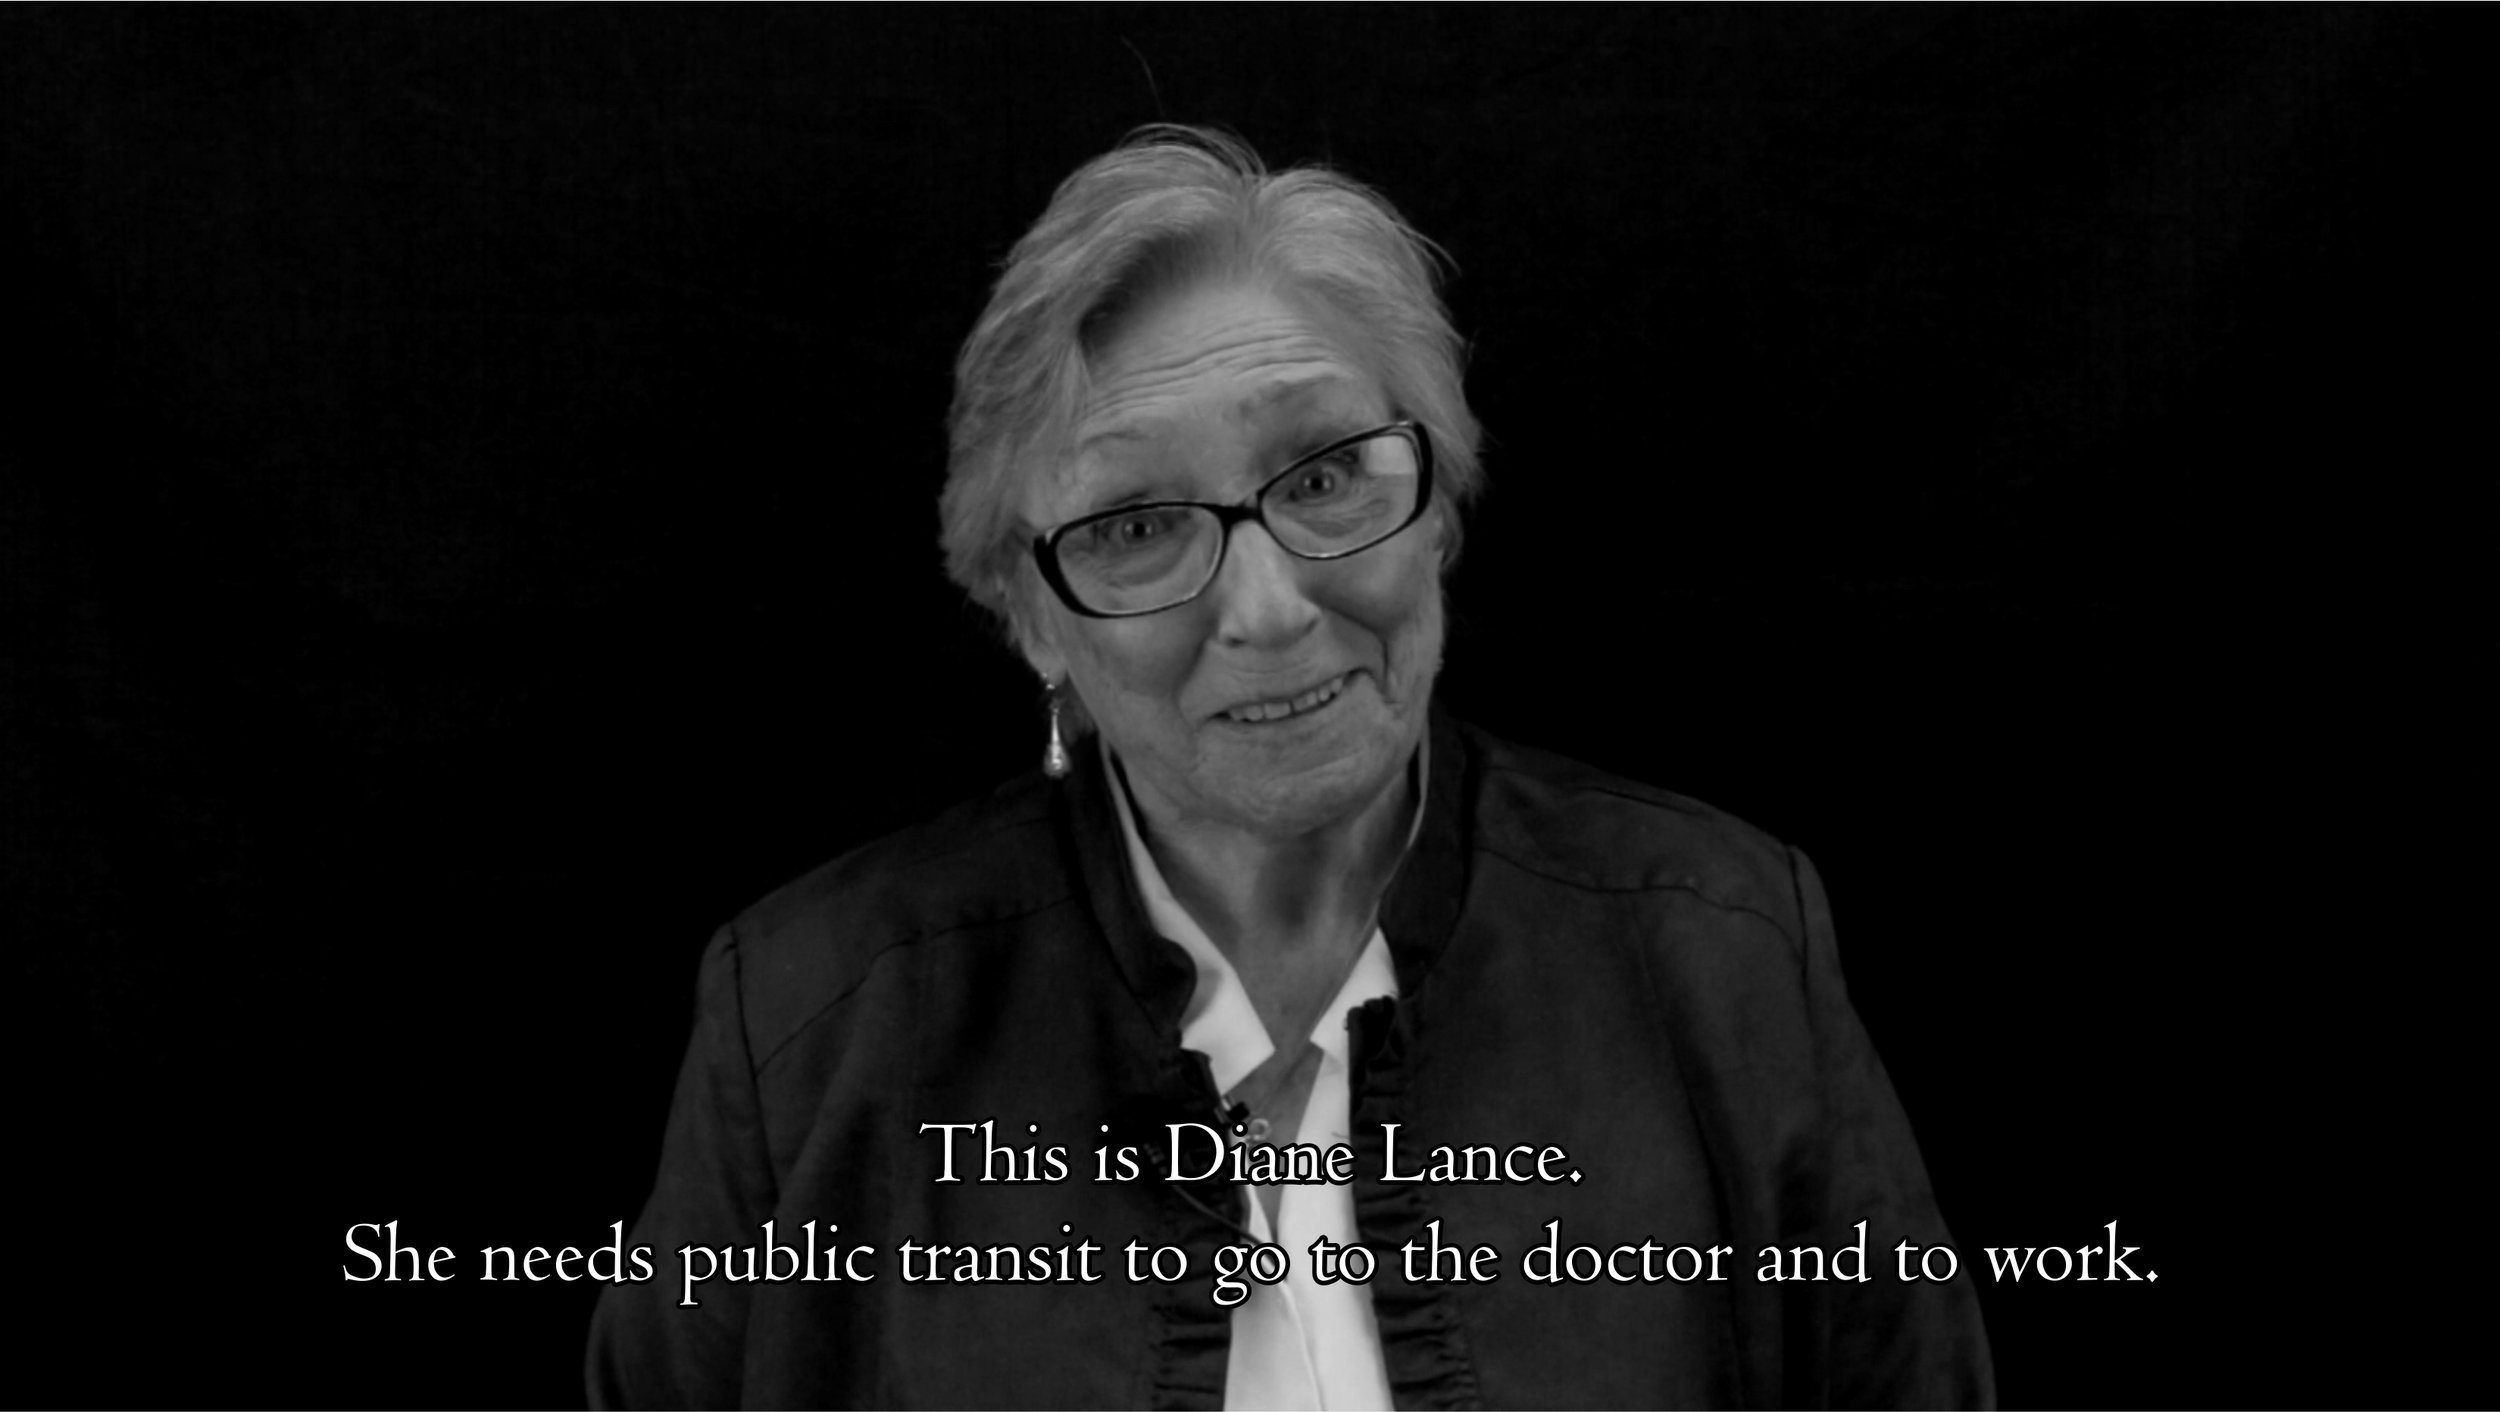 Diane Lance grayscale.jpg